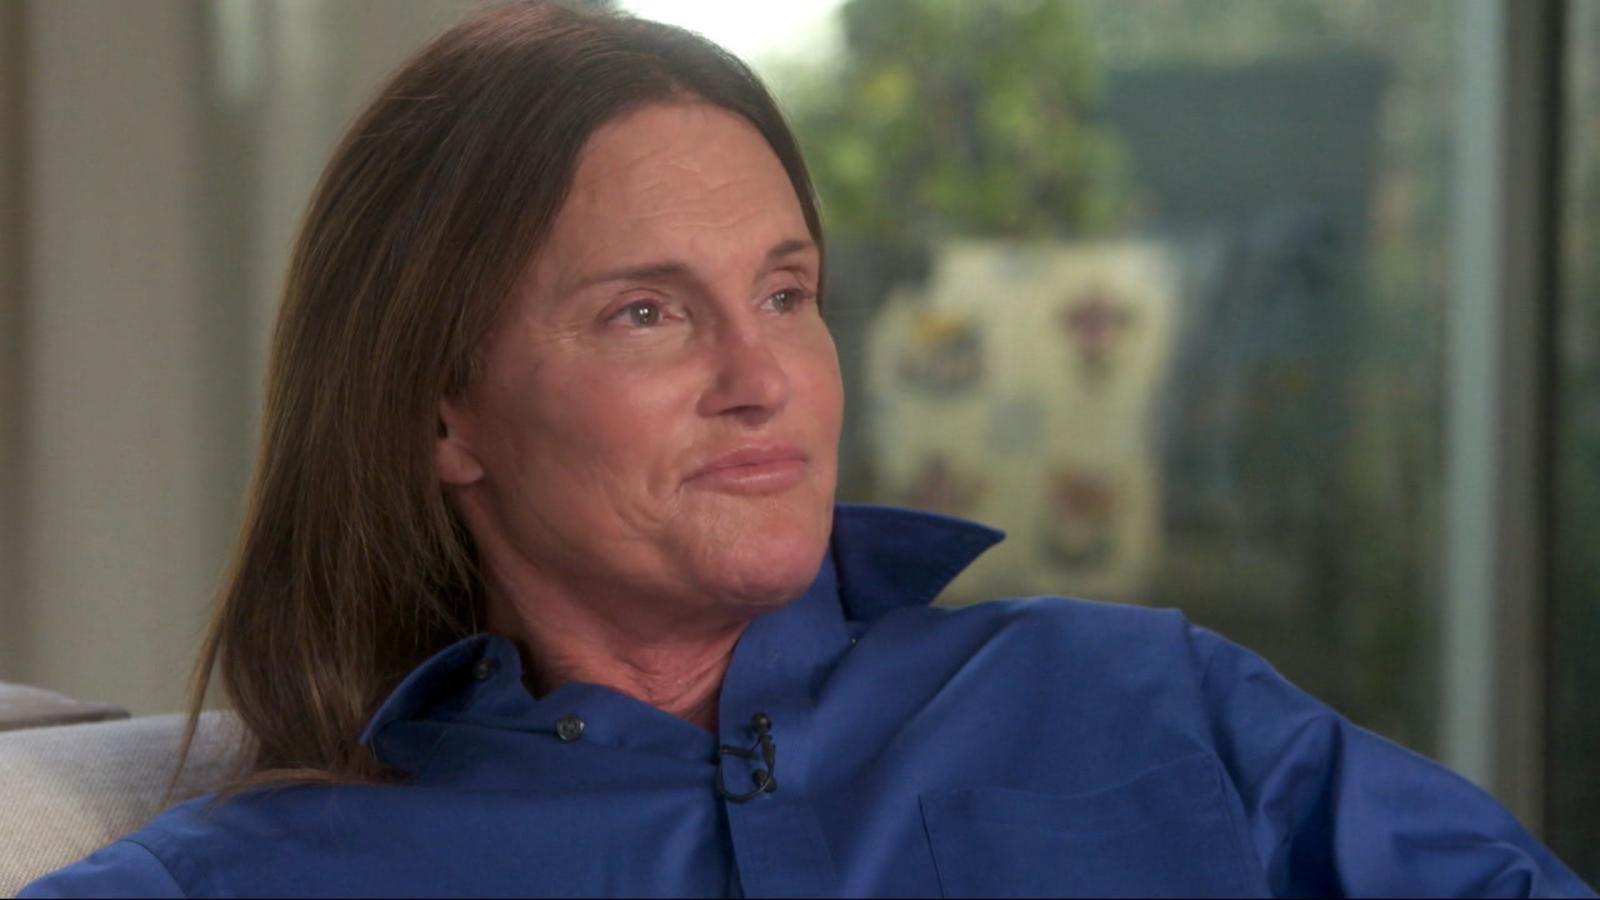 Caitlyn Jenner ESPN Speech:  A Publicity Stunt With An Agenda?